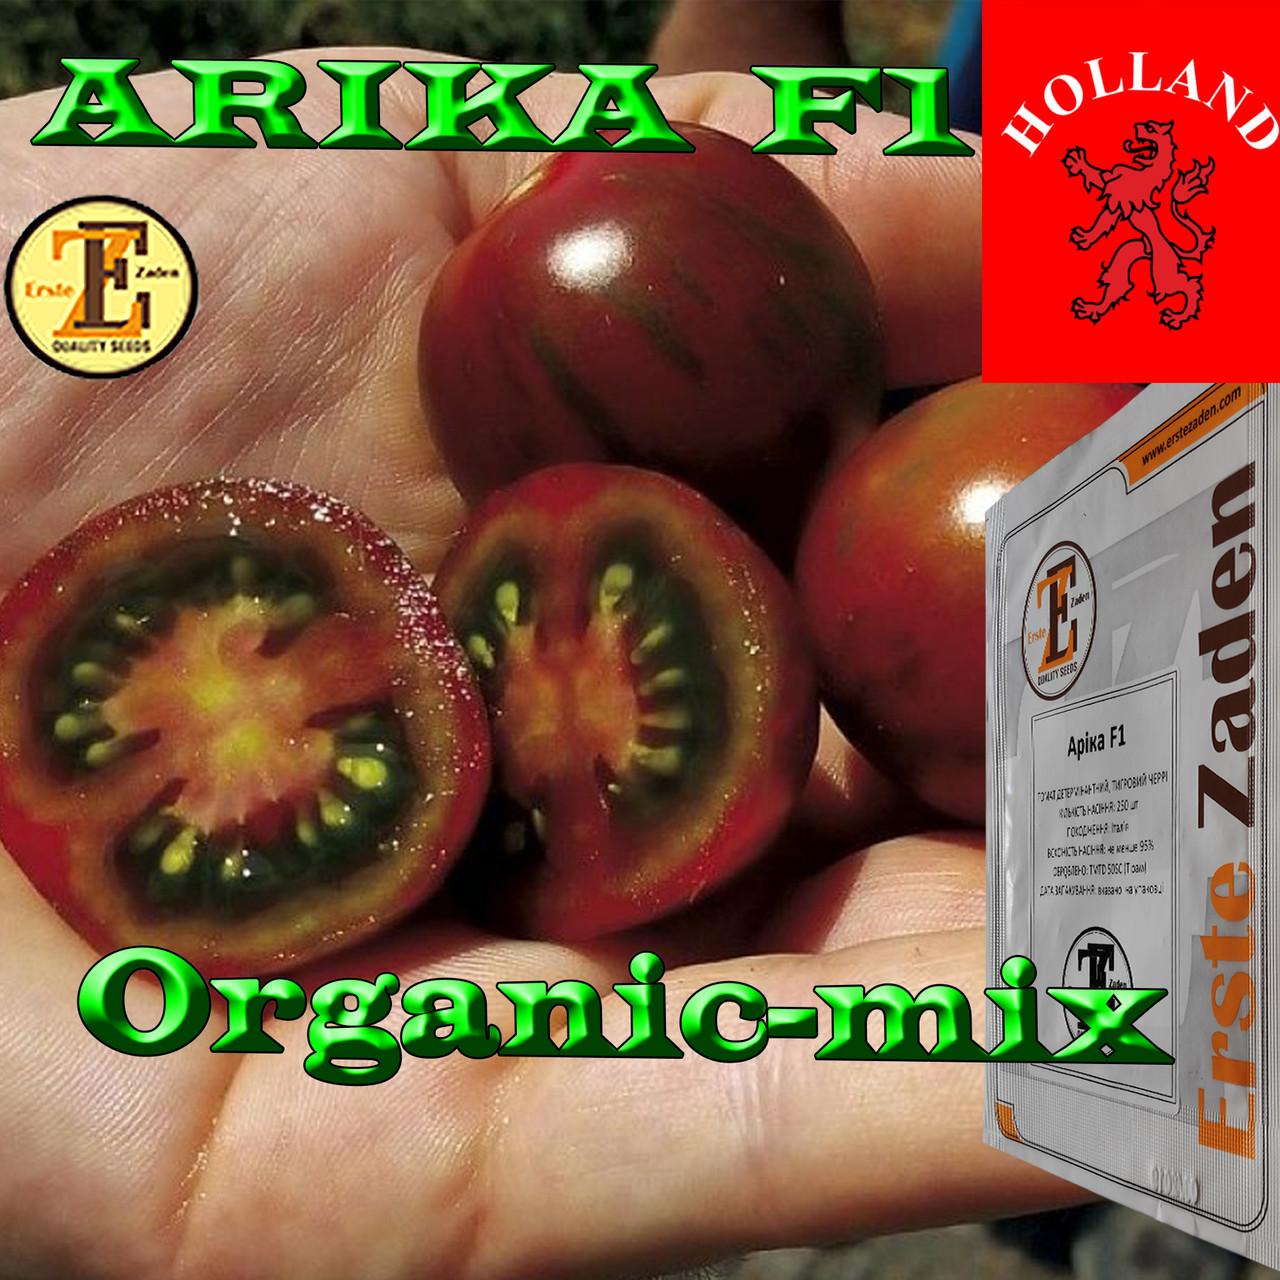 Семена, томат Черри тигровый (низкорослый), АРИКА F1 / ARIKA F1 от ТМ Erste Zaden, 250 семян